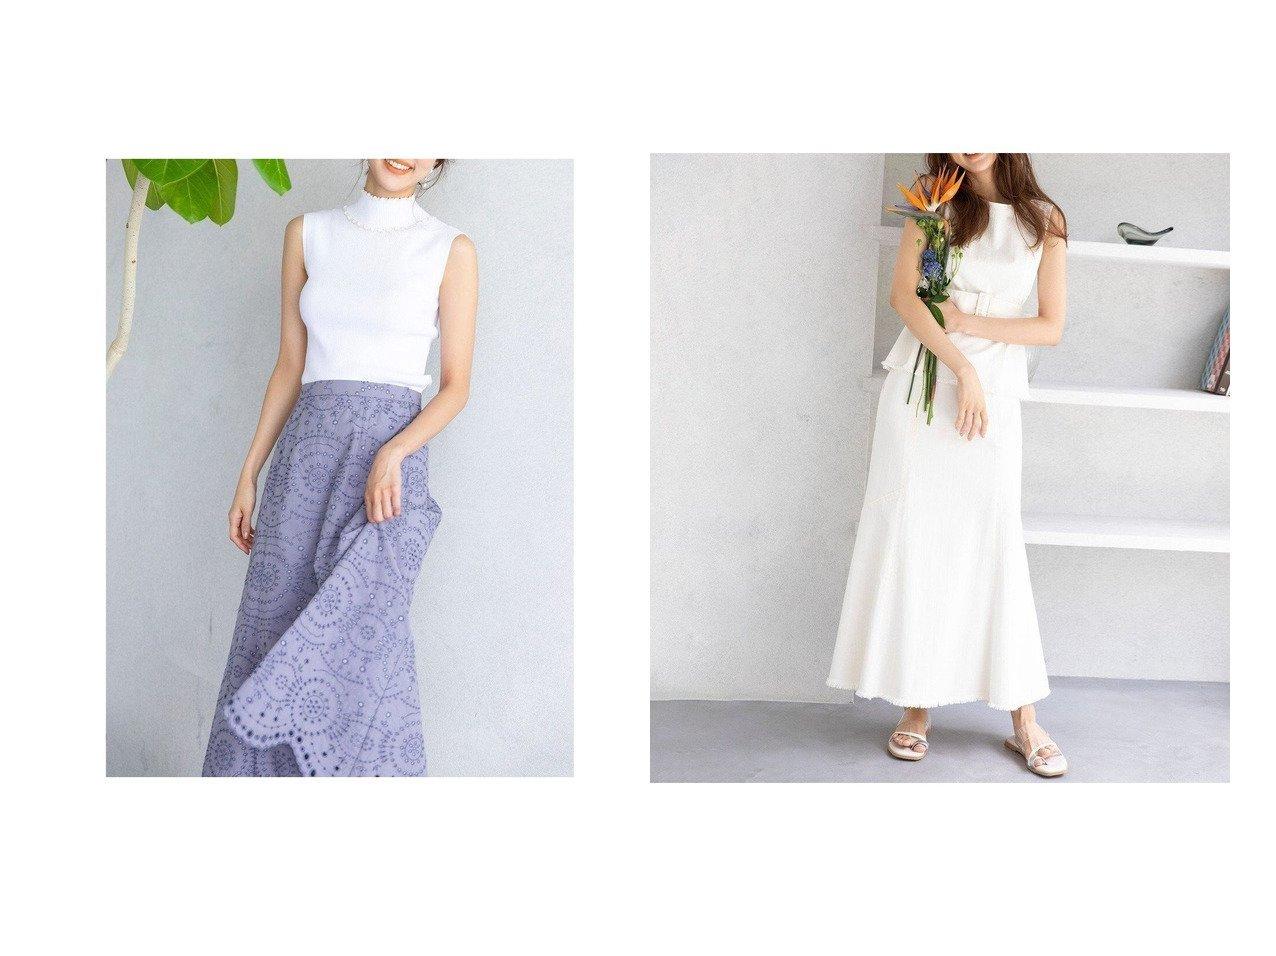 【TOCCA/トッカ】の【TOCCA LAVENDER】FOODTEXTILE Embroidery Skirt スカート&【TOCCA LAVENDER】【SET UP】Eco Denim Skirt スカート 【スカート】おすすめ!人気、トレンド・レディースファッションの通販 おすすめで人気の流行・トレンド、ファッションの通販商品 インテリア・家具・メンズファッション・キッズファッション・レディースファッション・服の通販 founy(ファニー) https://founy.com/ ファッション Fashion レディースファッション WOMEN スカート Skirt デニムスカート Denim Skirts 送料無料 Free Shipping |ID:crp329100000044063